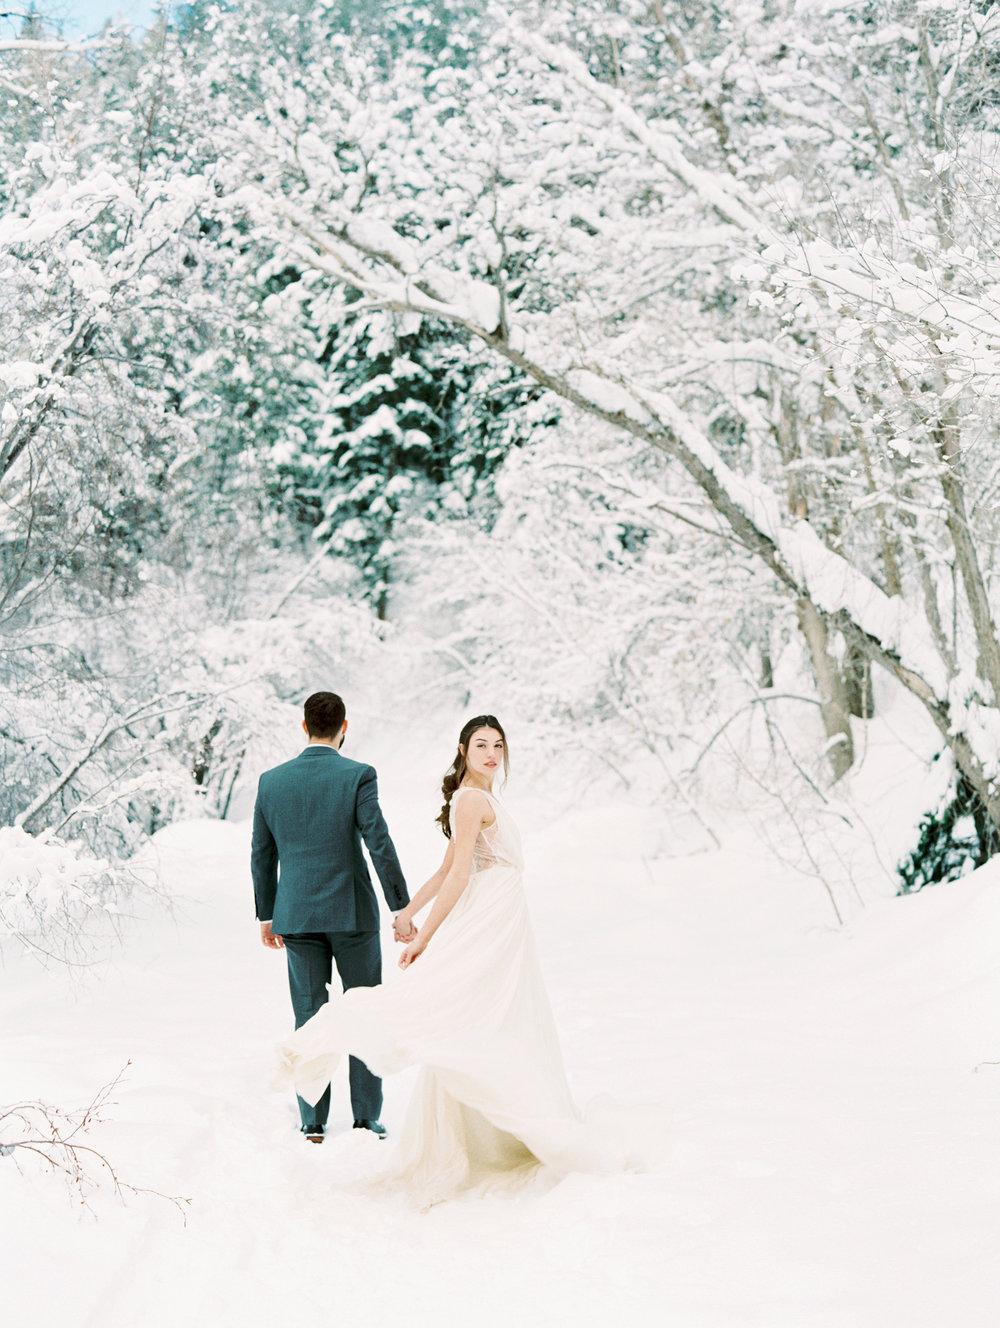 BellaCosa_WinterWonderland-25.jpg